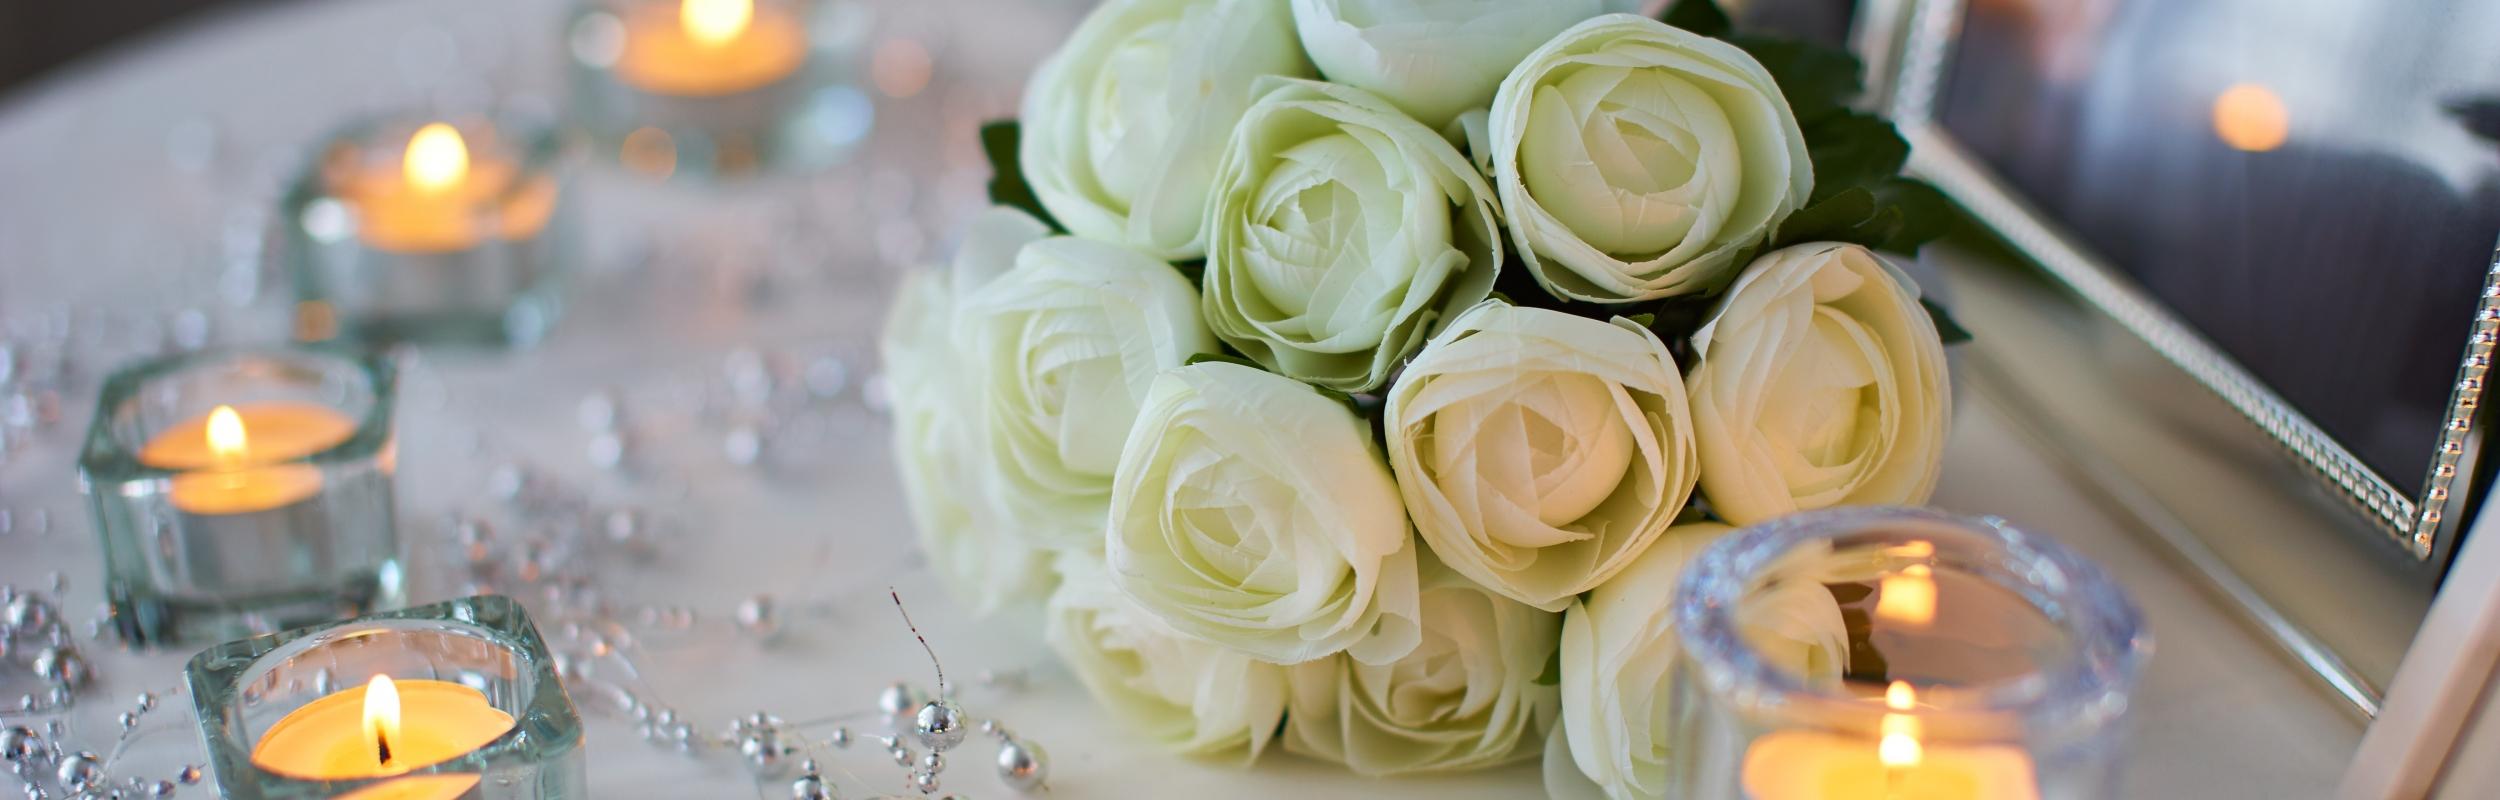 wedding-1537147